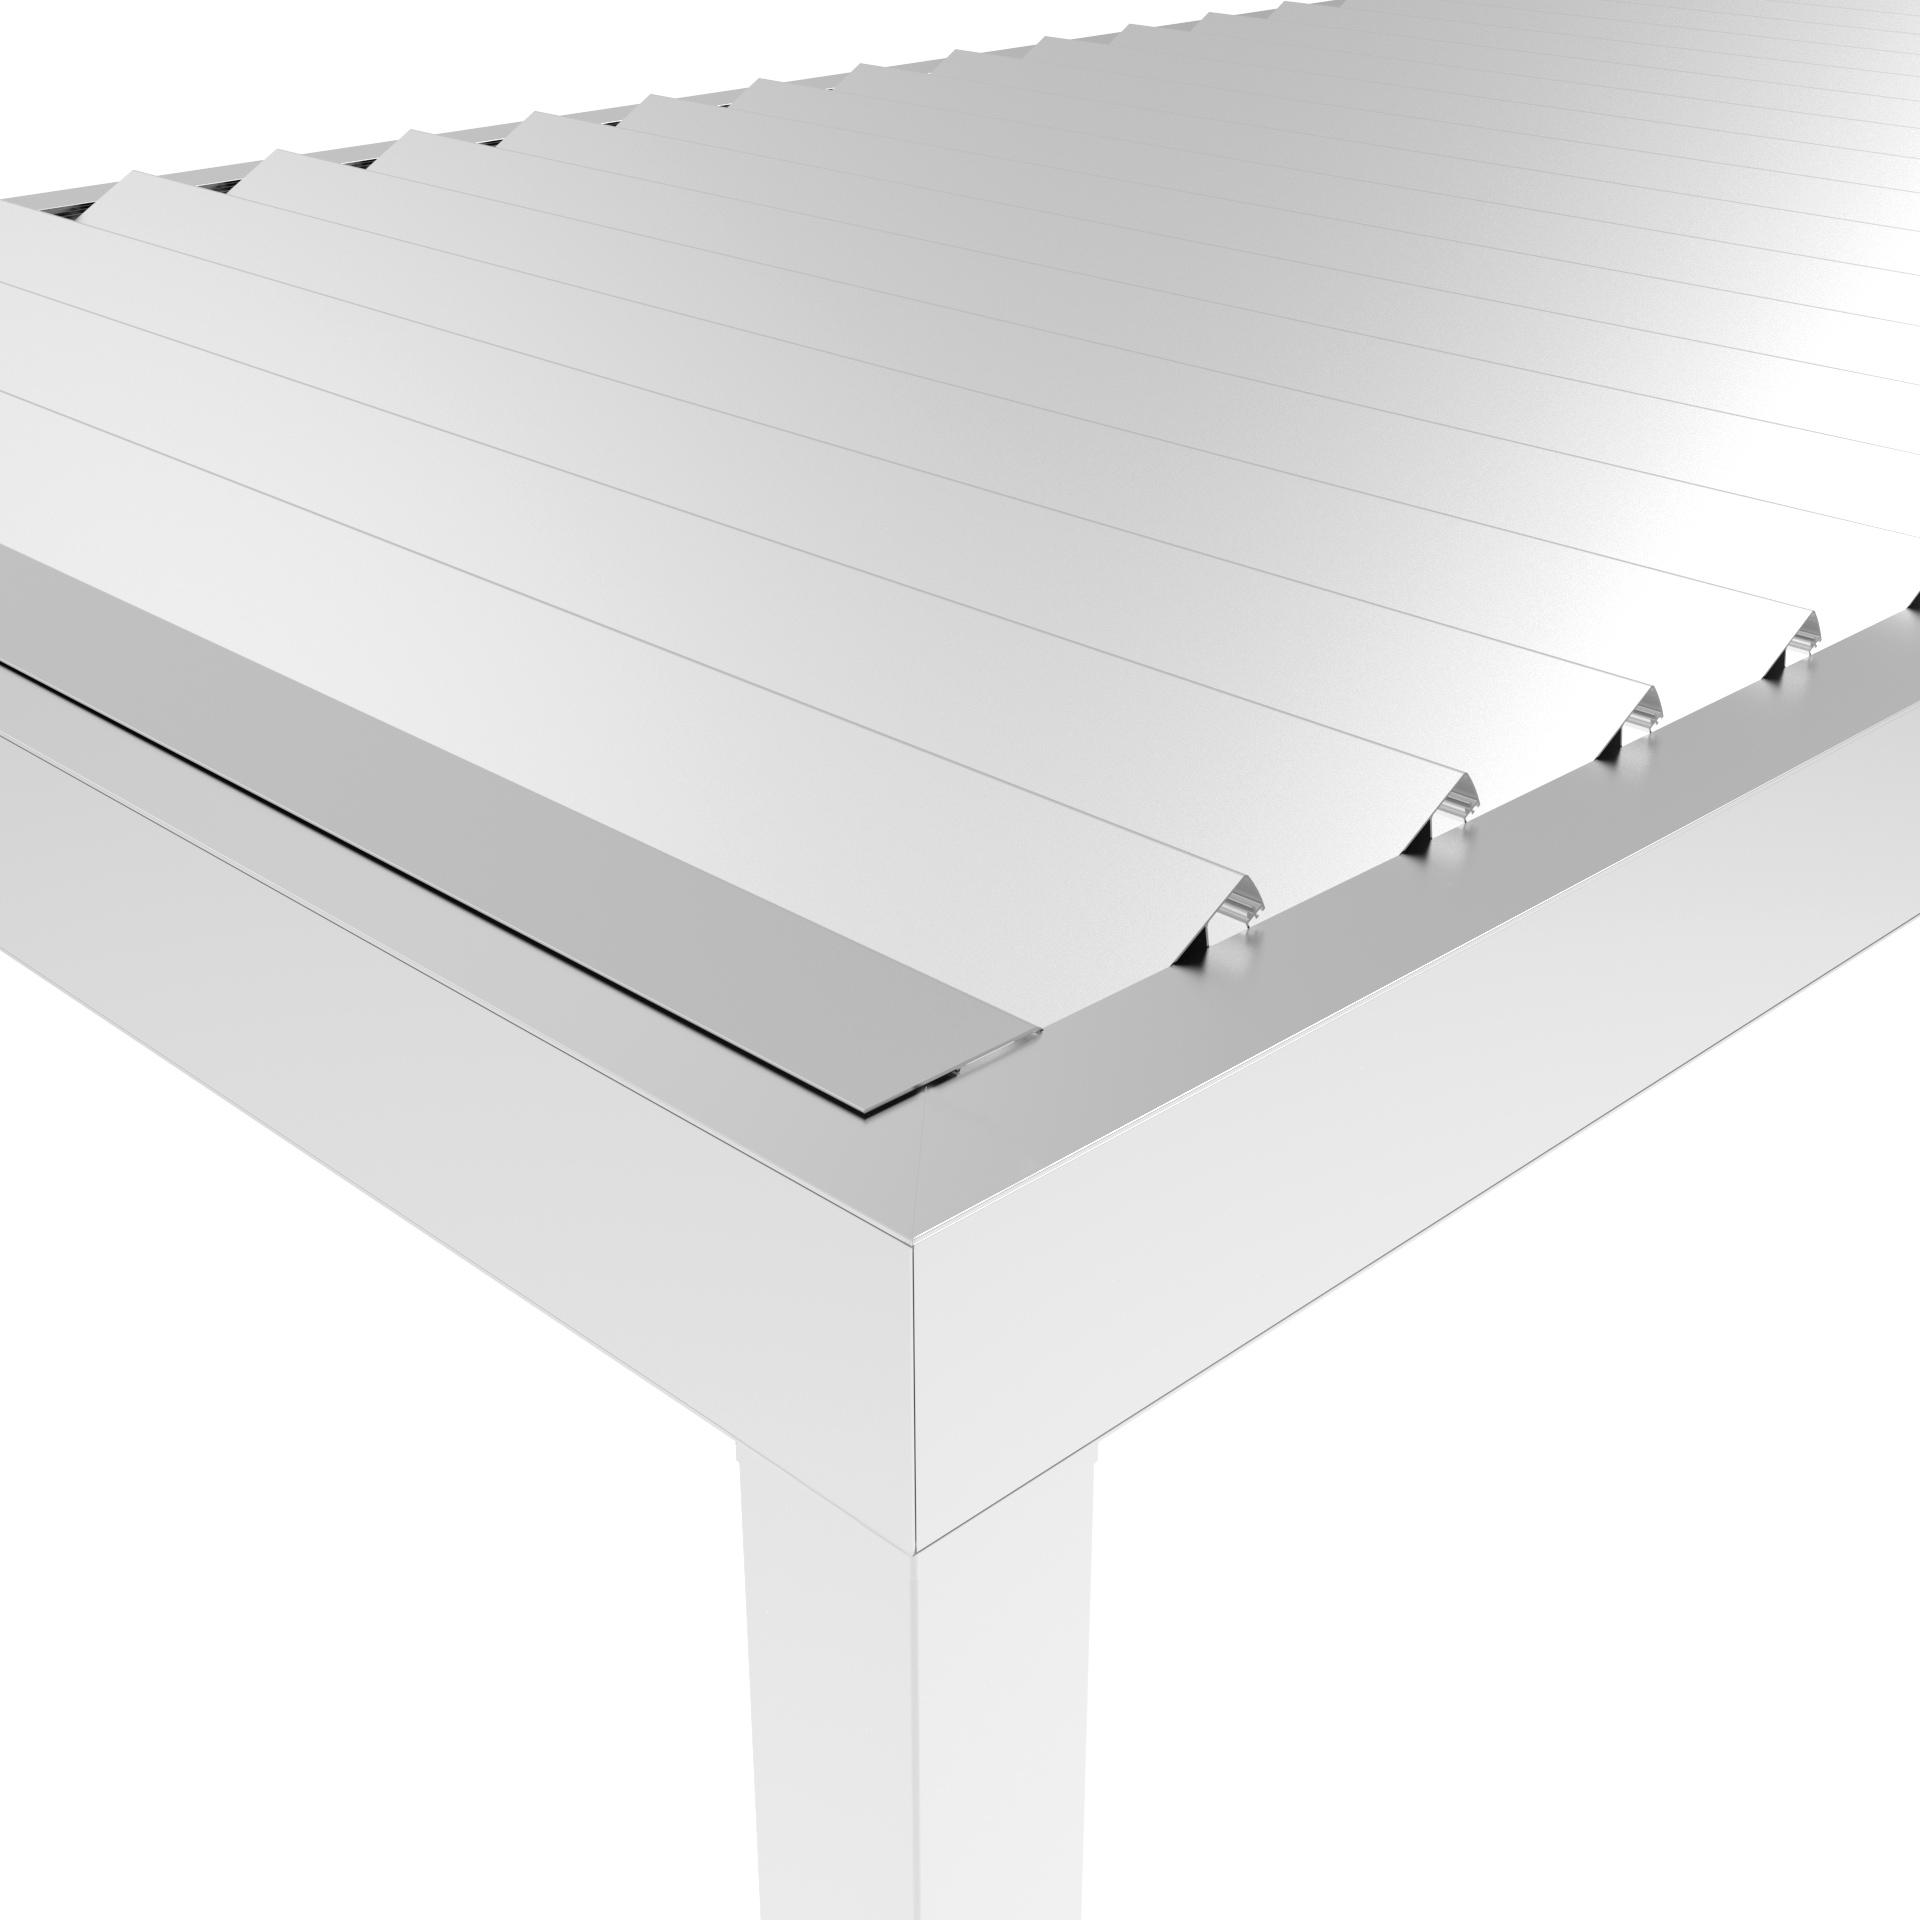 https://www.allpaint.it/wp-content/uploads/2021/07/gazebo-klimatik-alluminio-allpaint.jpg